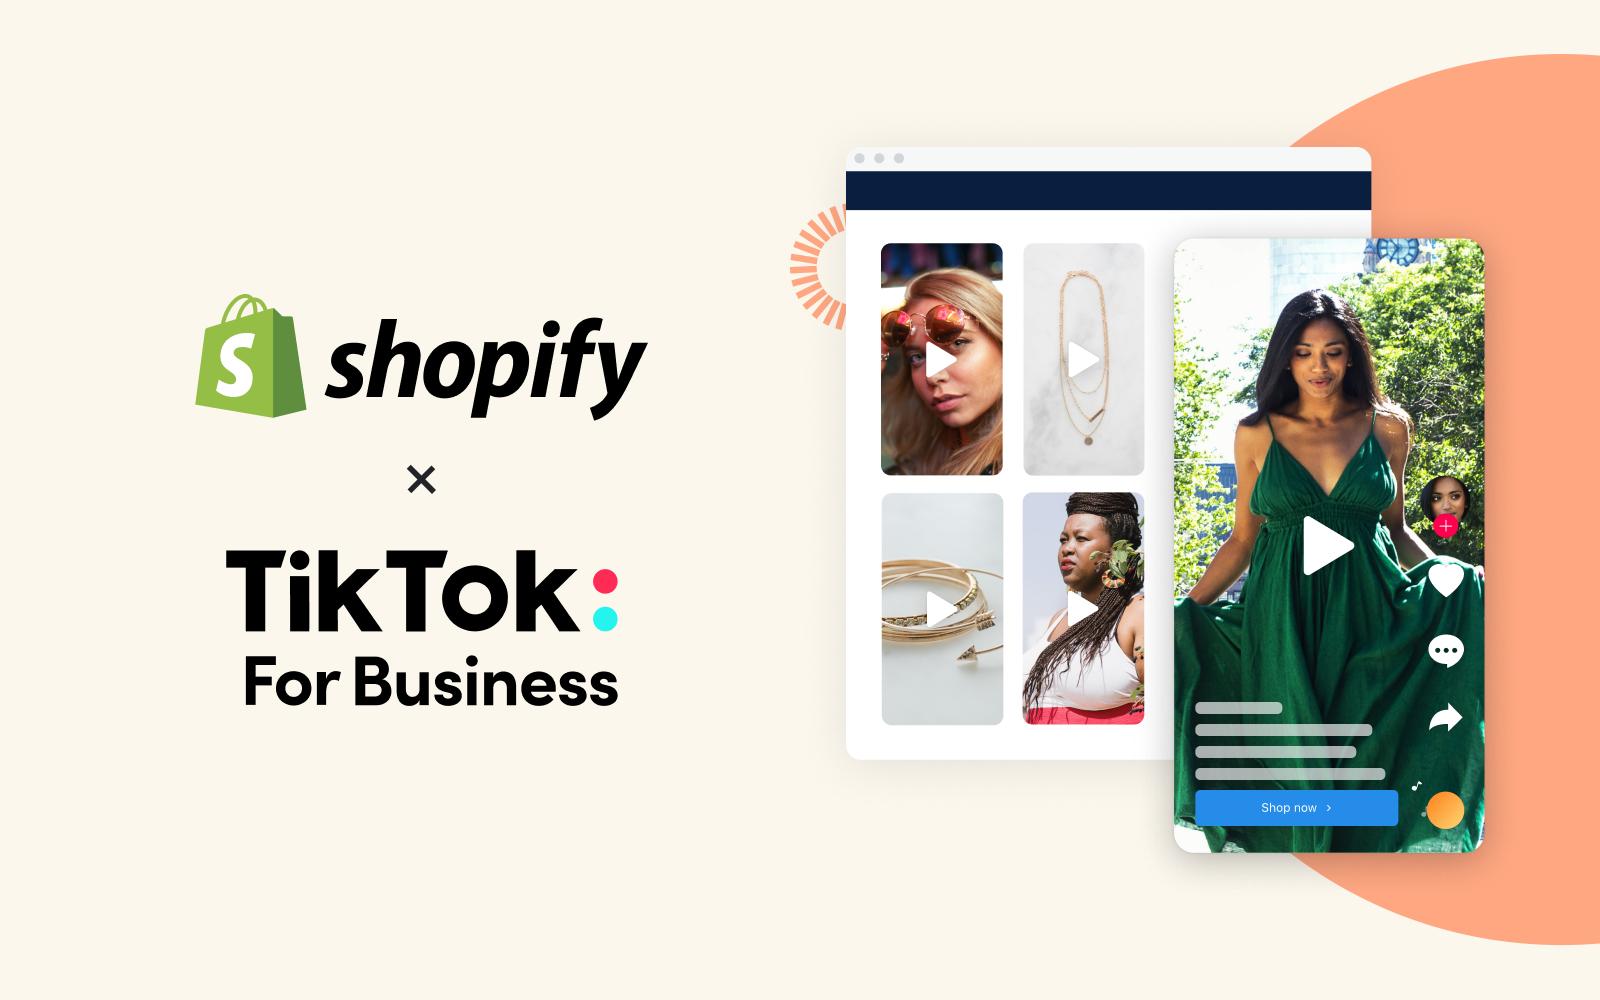 Tiktok And Shopify Partnership To Enable Australian Merchants To Connect With Tiktok S Engaged Audience Tiktok Newsroom